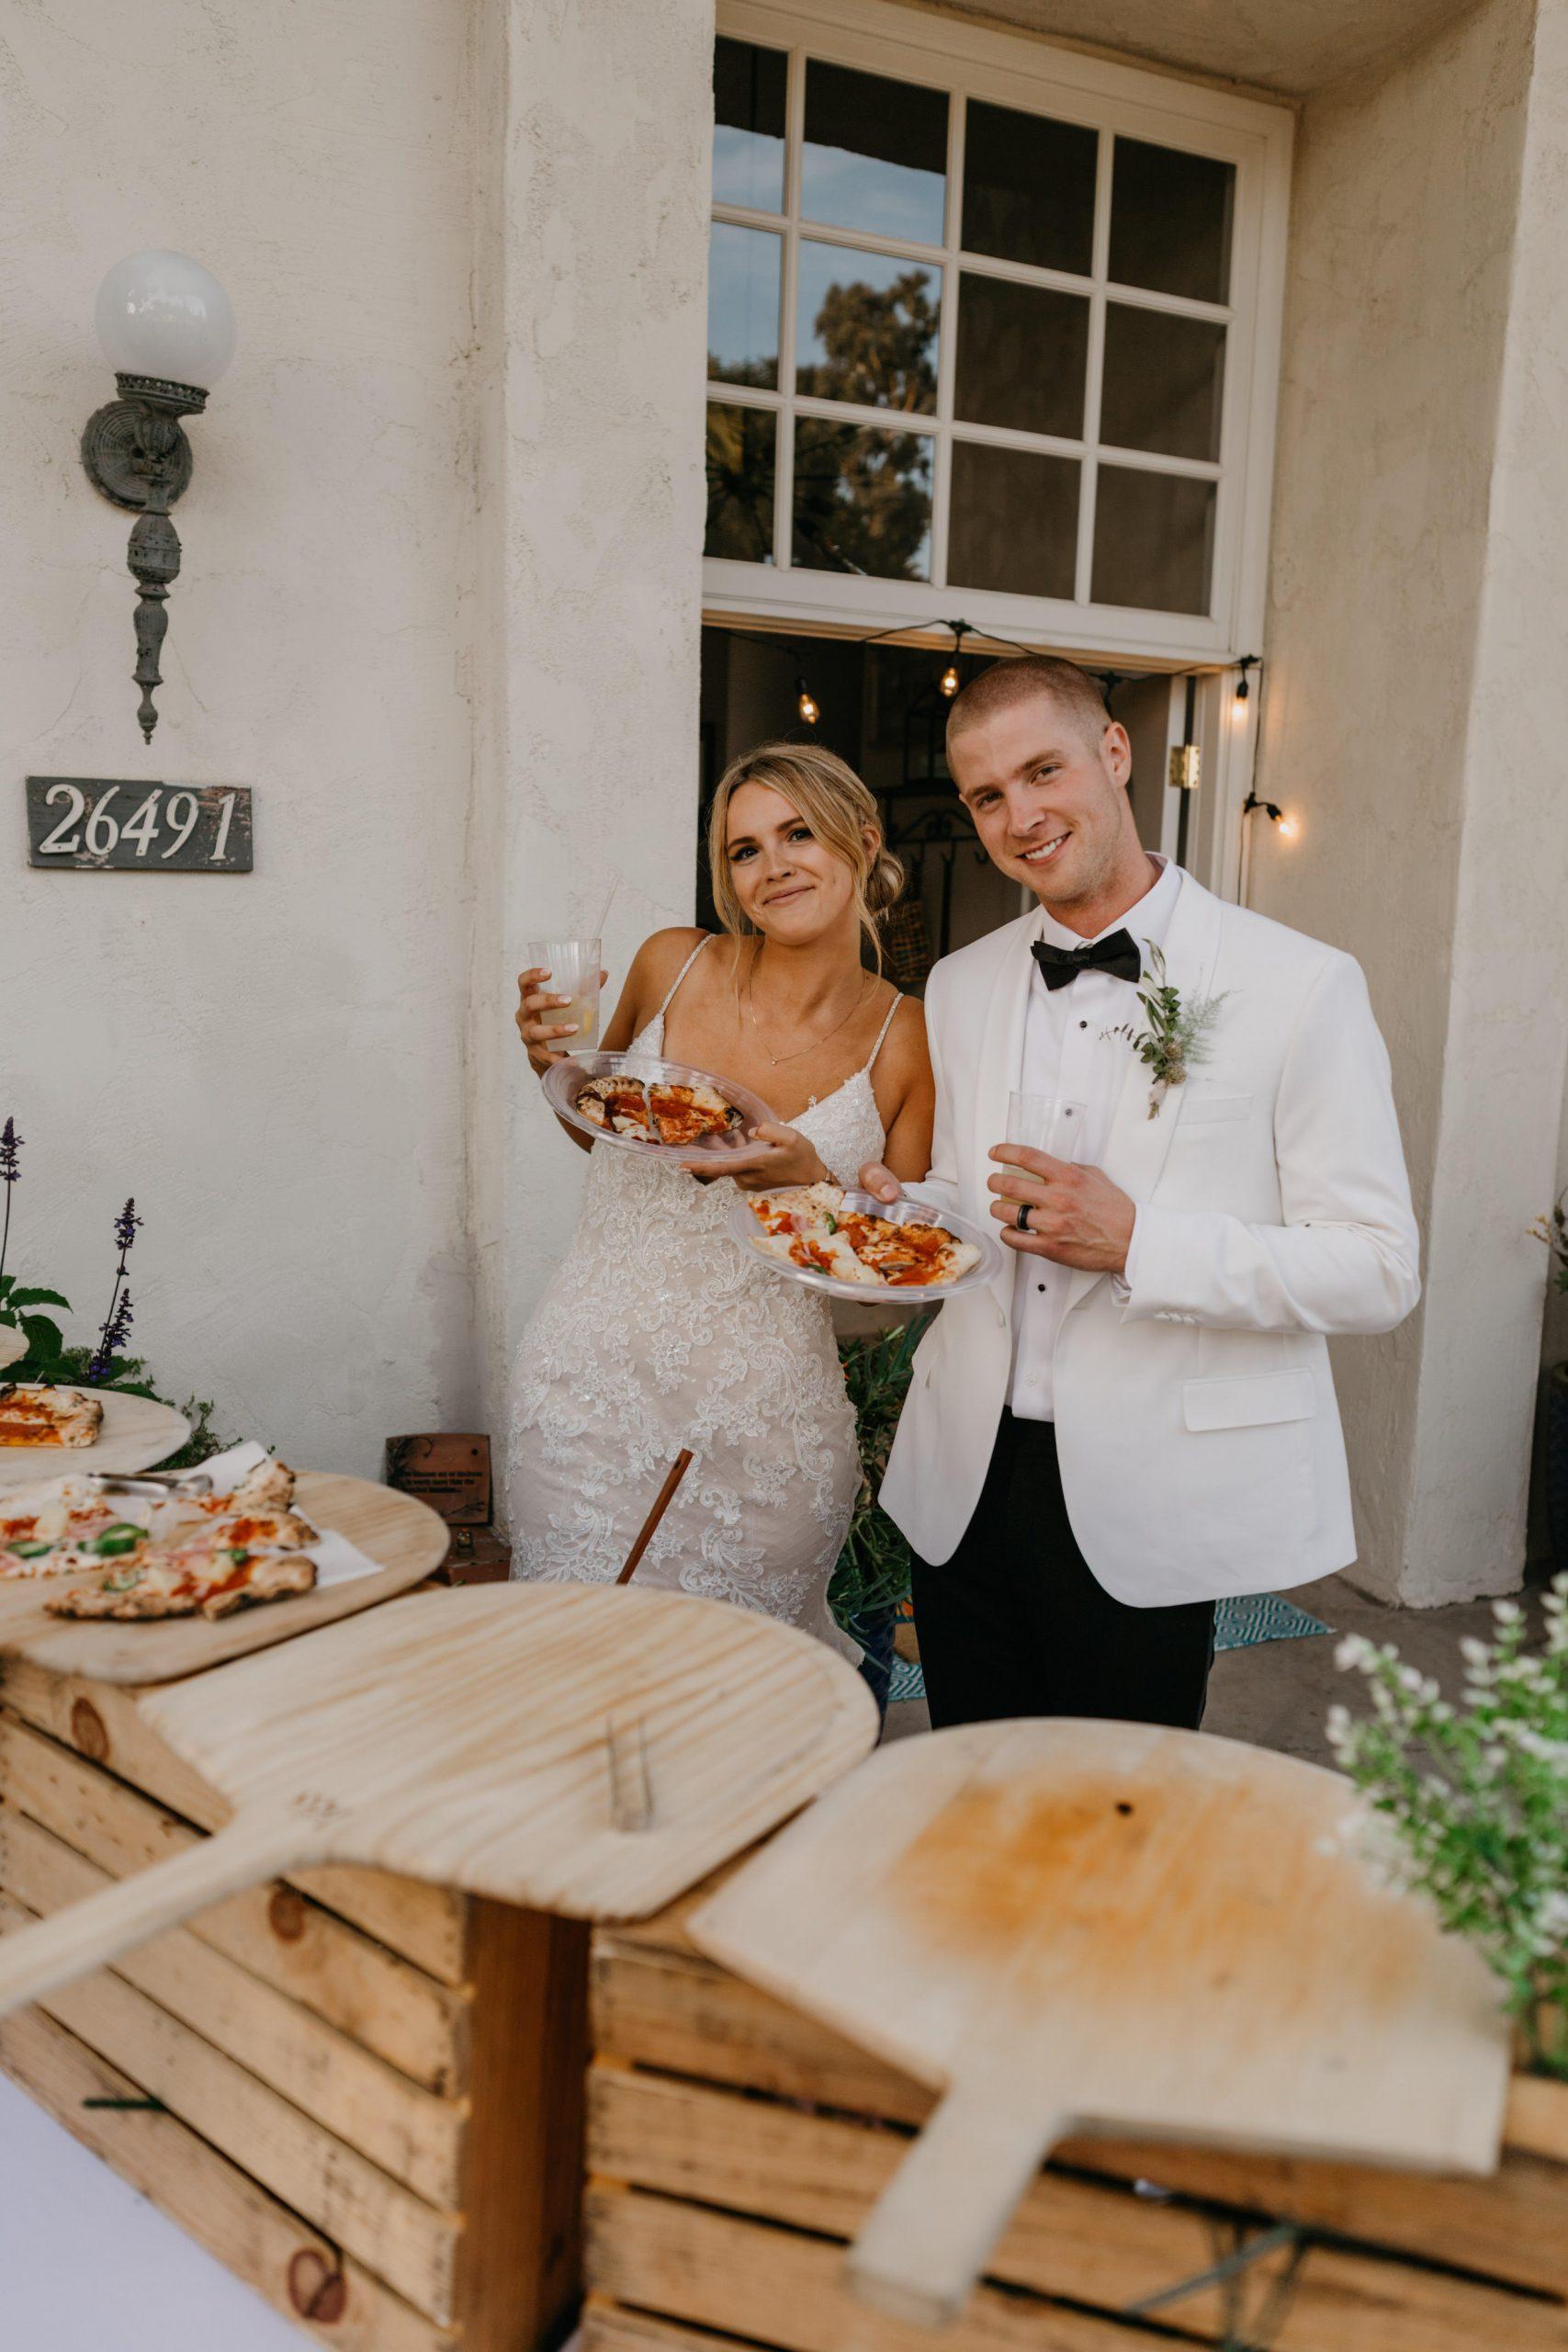 Pizza Buffet food in Laguna Beach Backyard Wedding, image by Fatima Elreda Photo